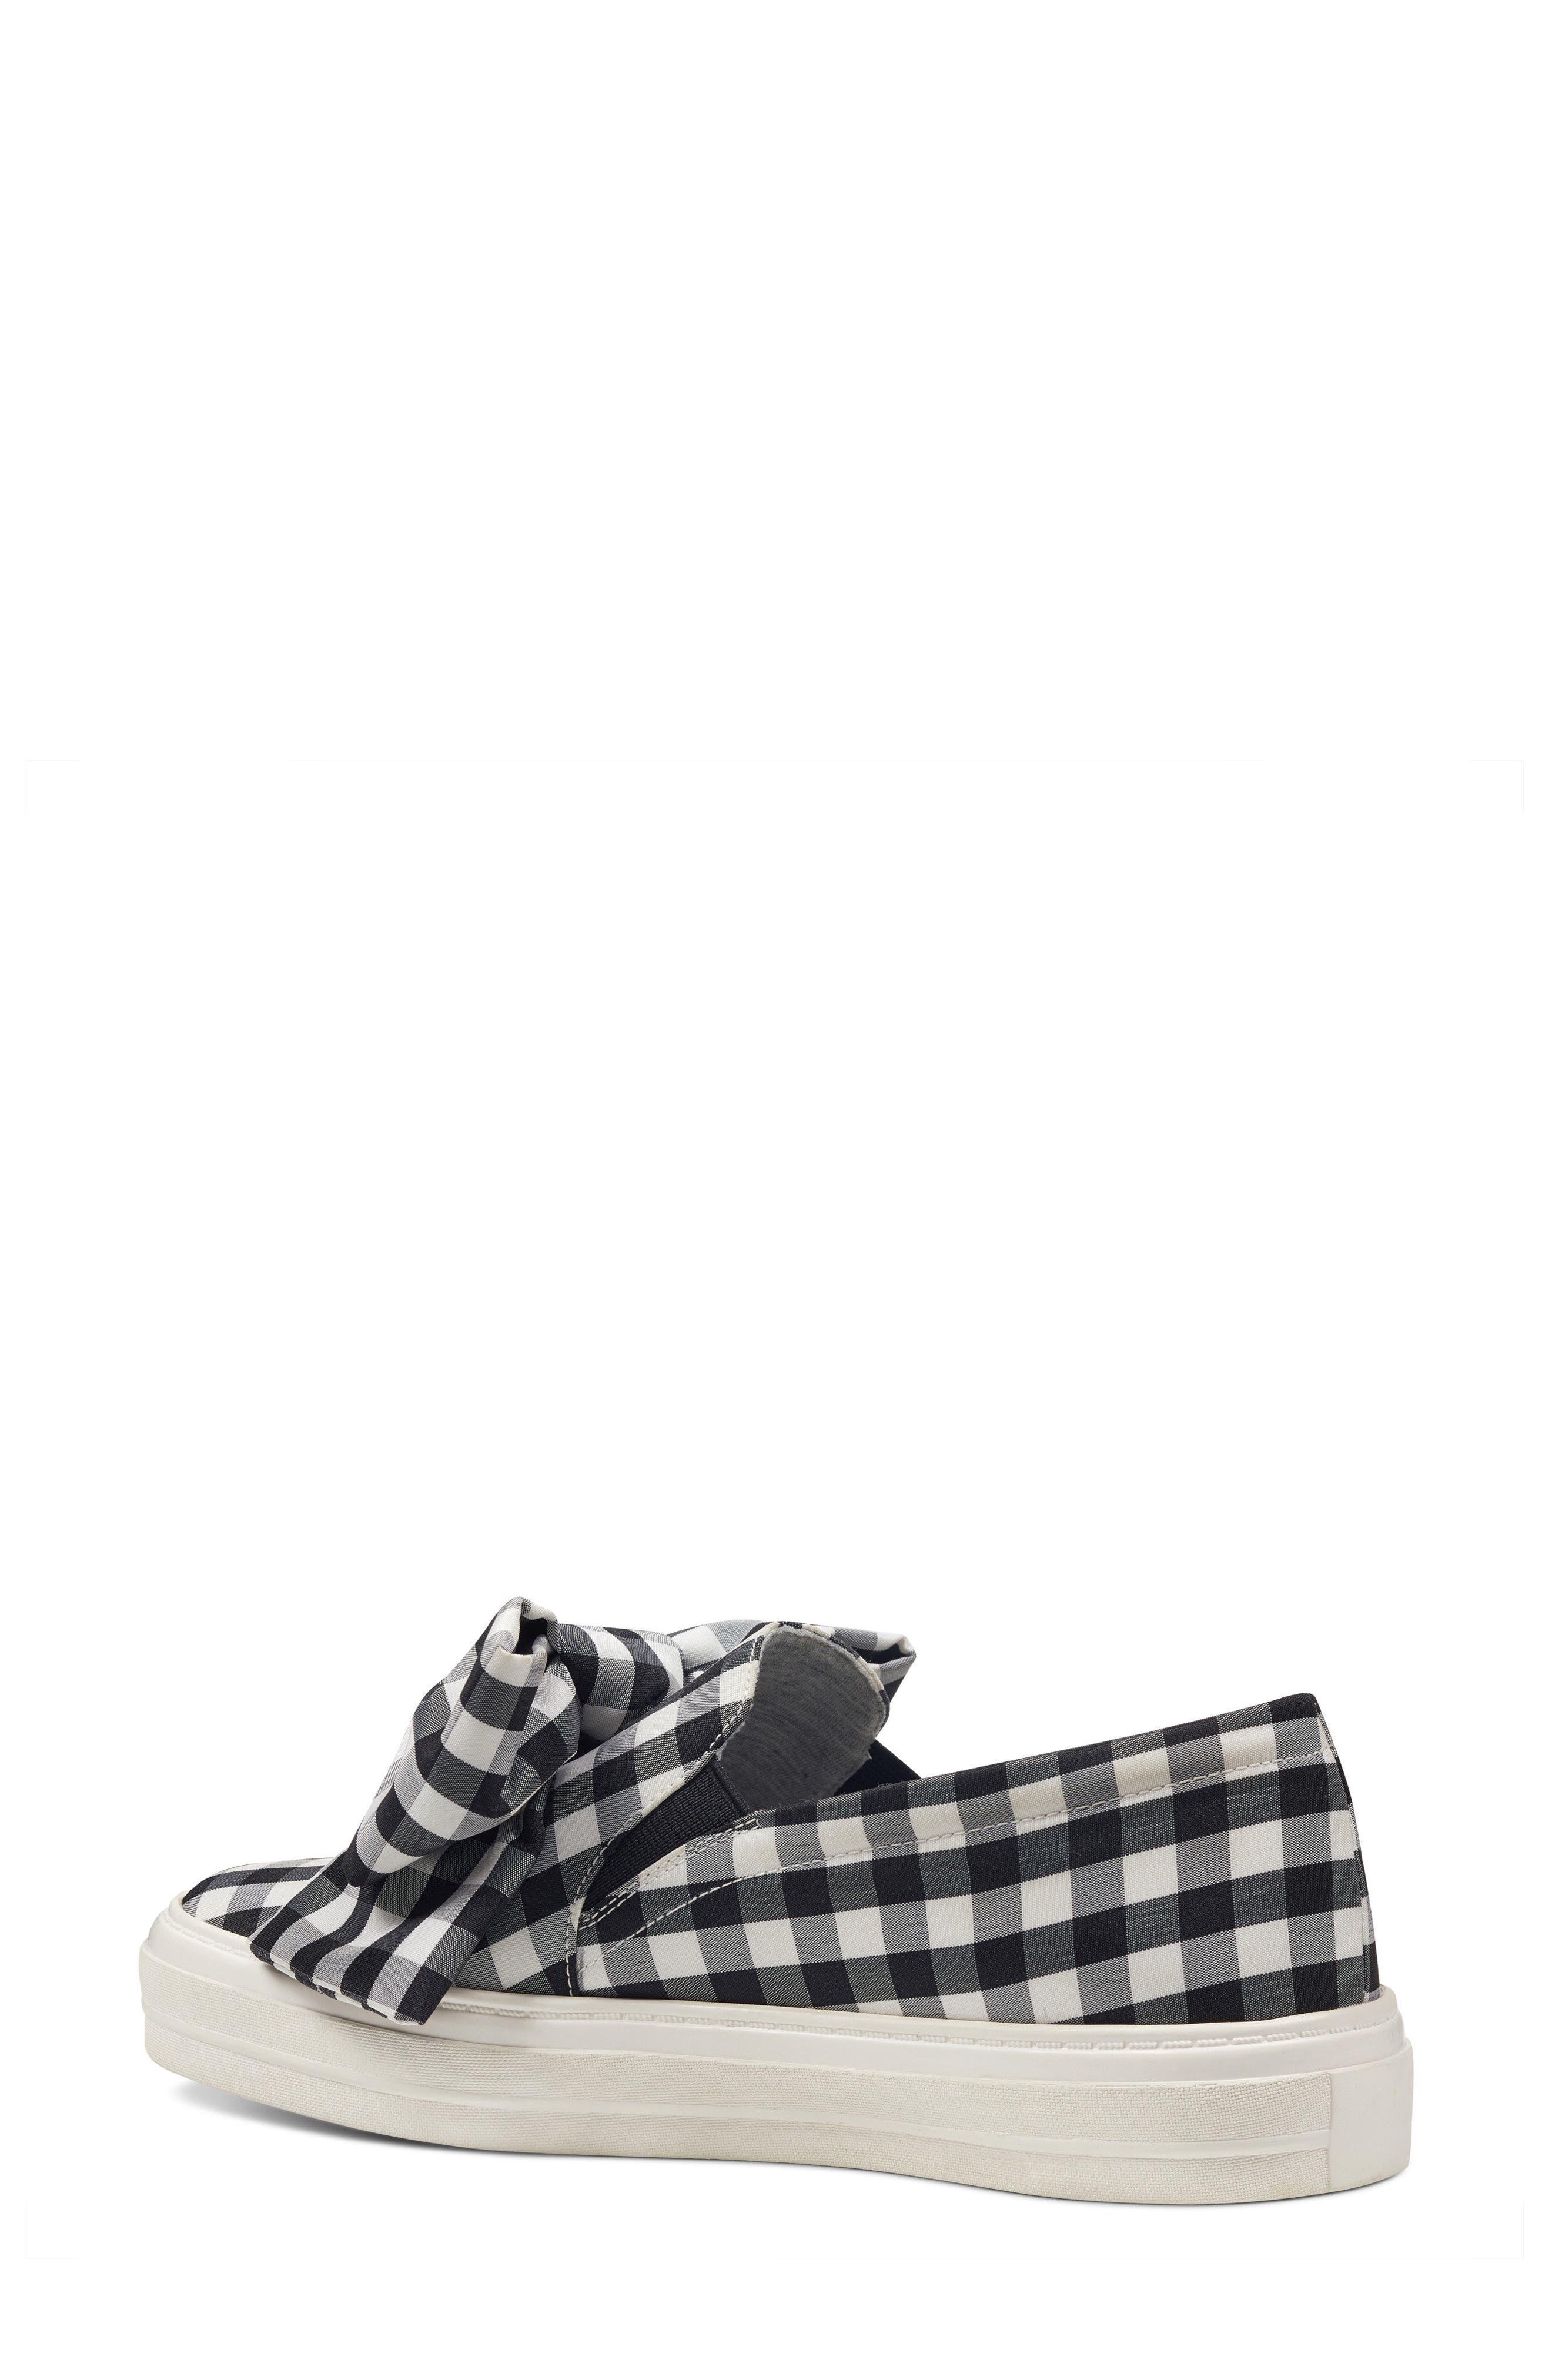 Onosha Bow Slip-On Sneaker,                             Alternate thumbnail 2, color,                             Black/ White Fabric